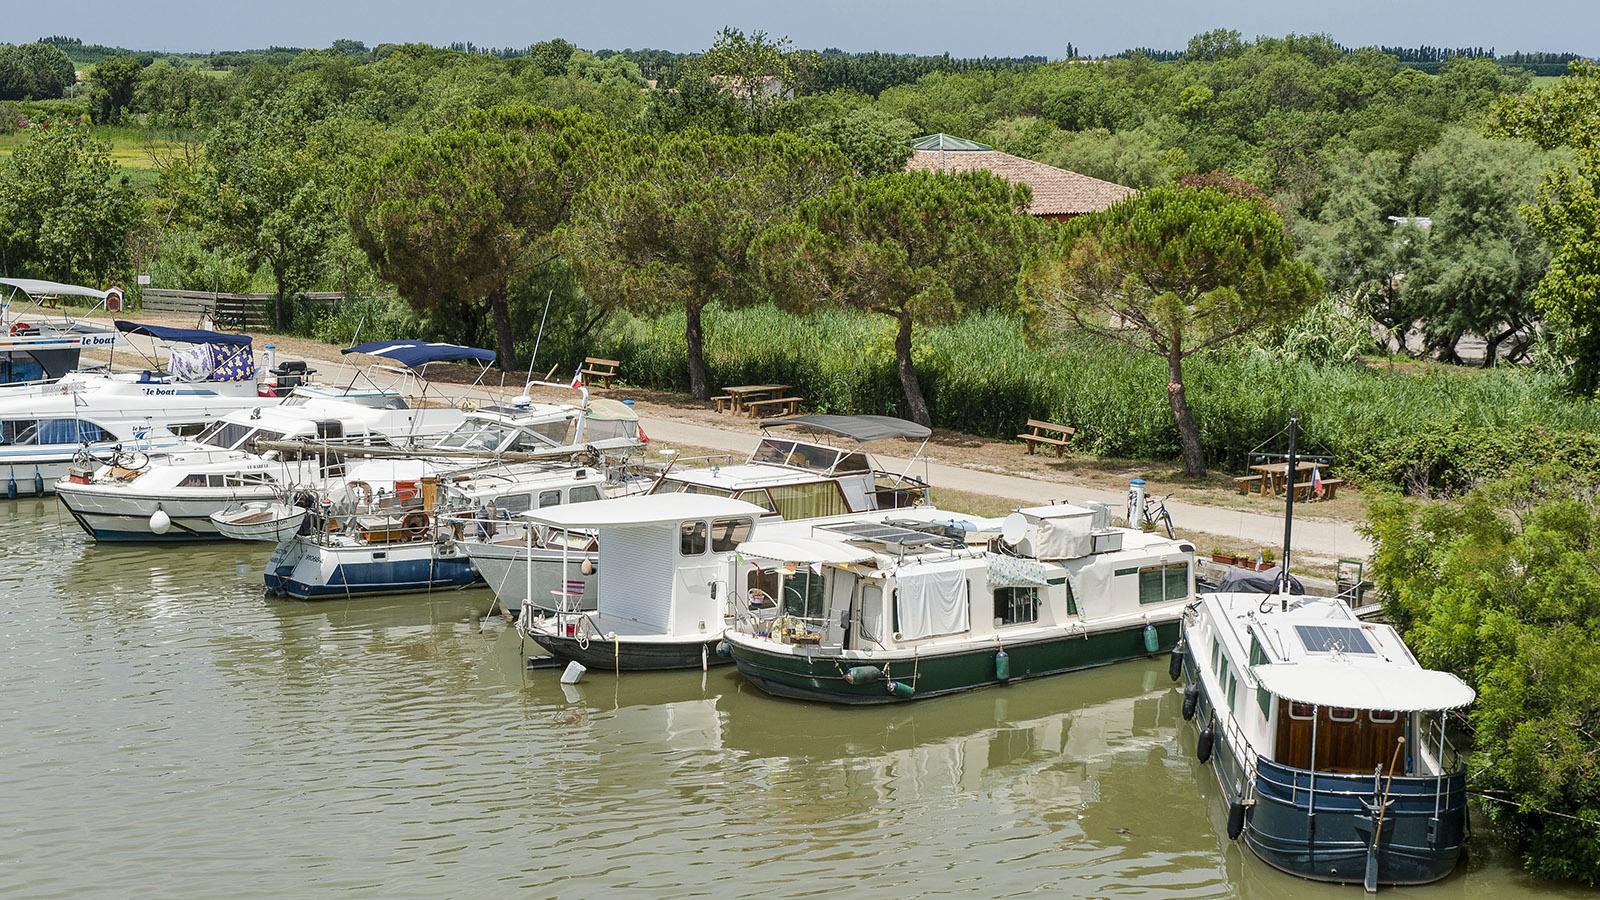 Petite Camargue: Der r Canal du Rhône à Sète ist ein beliebtes Hausbootrevier. Foto: Hilke Maunder